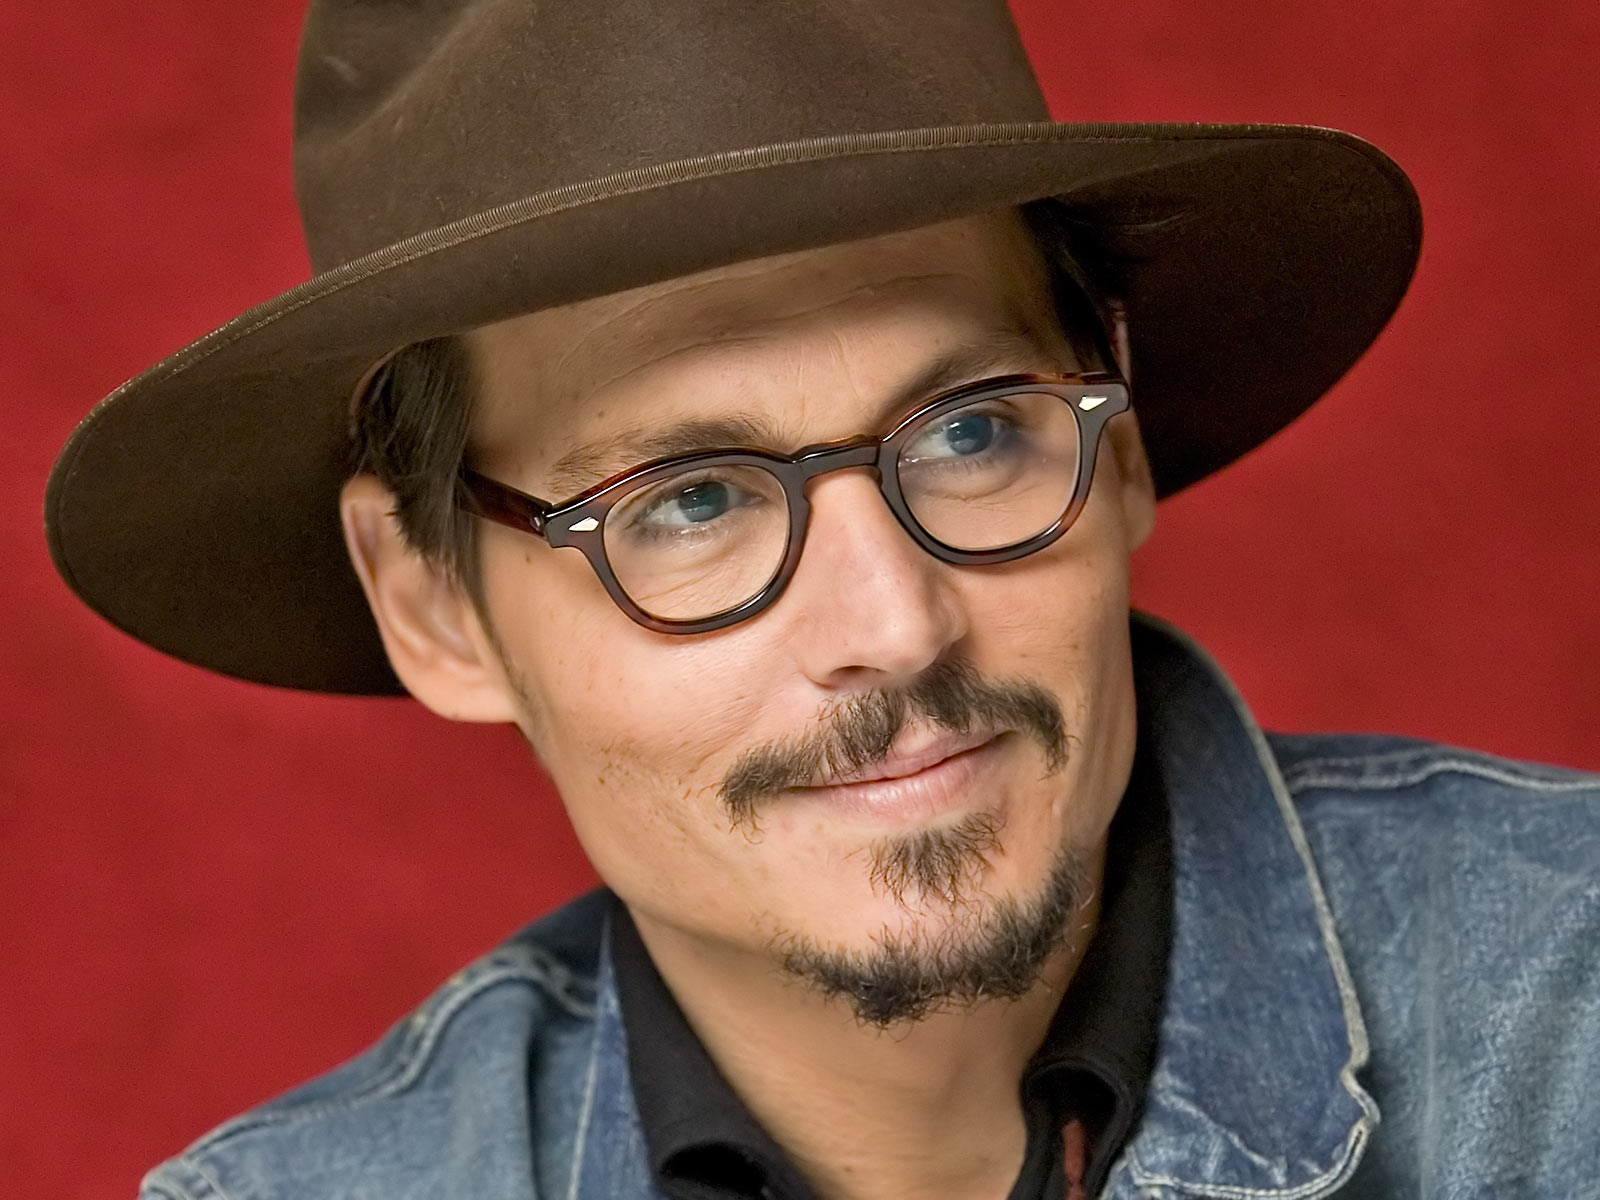 Men_Male_Celebrity_Johnny_Depp_010885_